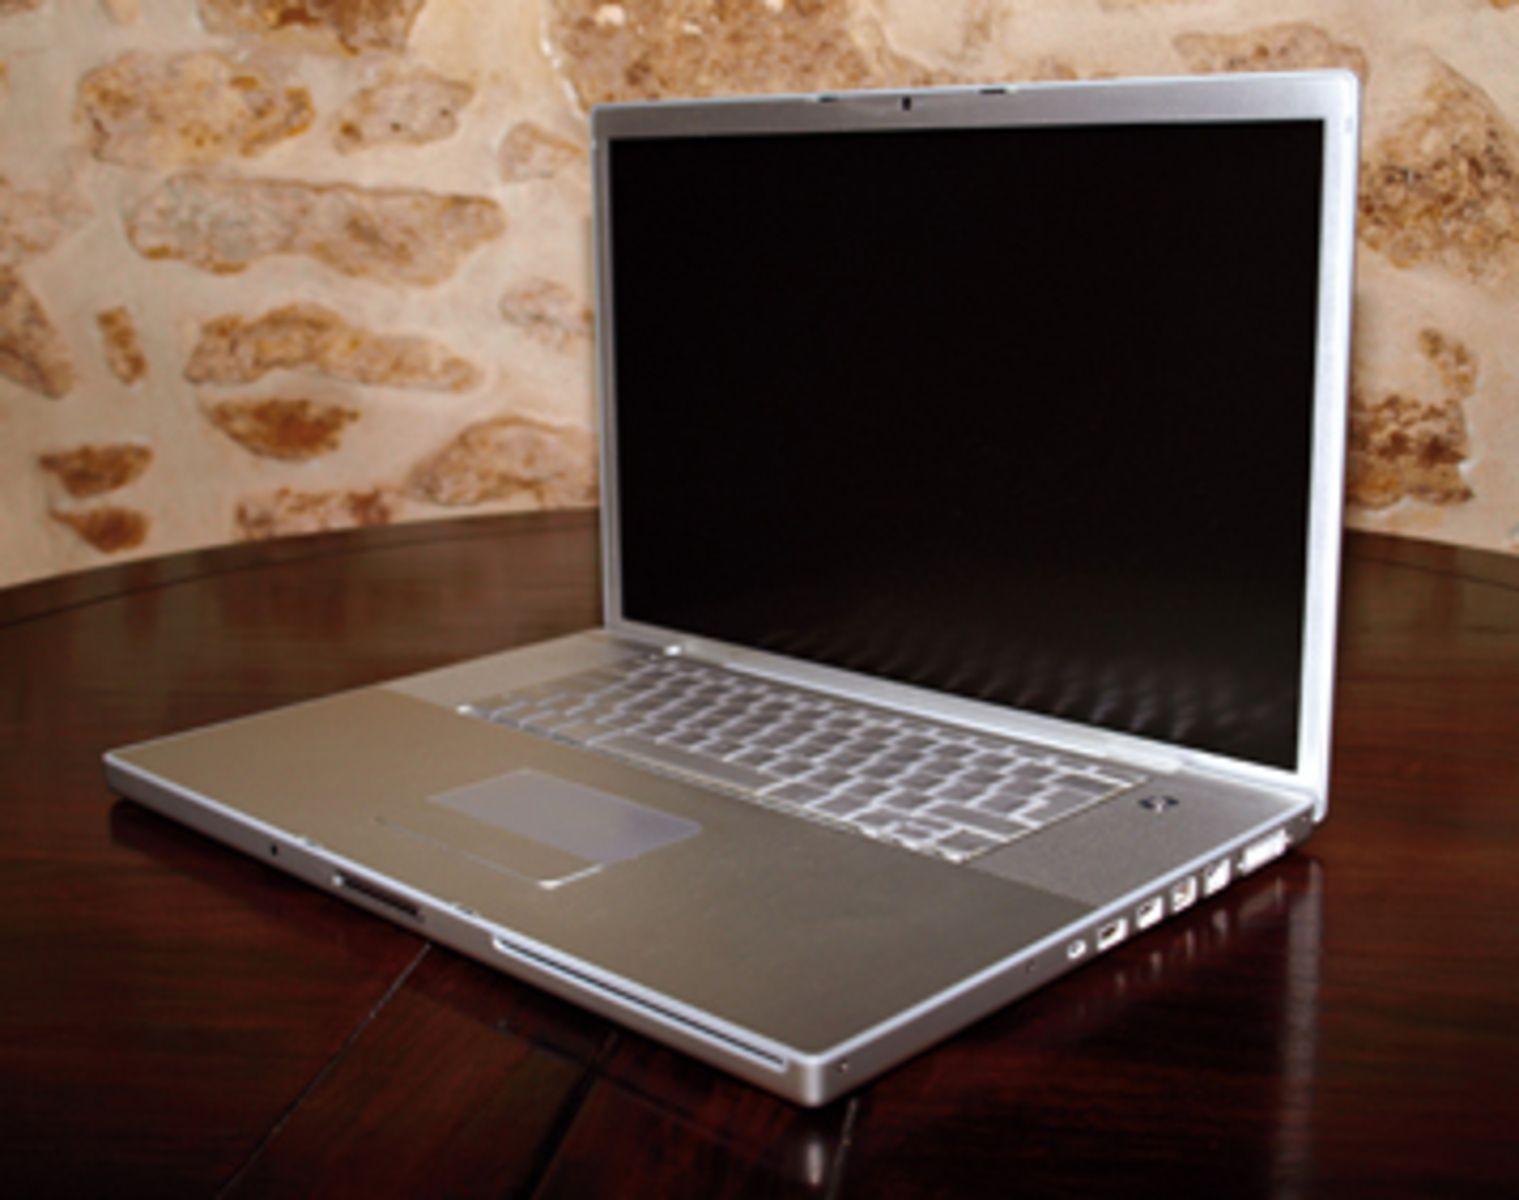 photo apple macbook pro 17 ghz intel core duo 120go ram 2go apple macbook pro 17. Black Bedroom Furniture Sets. Home Design Ideas